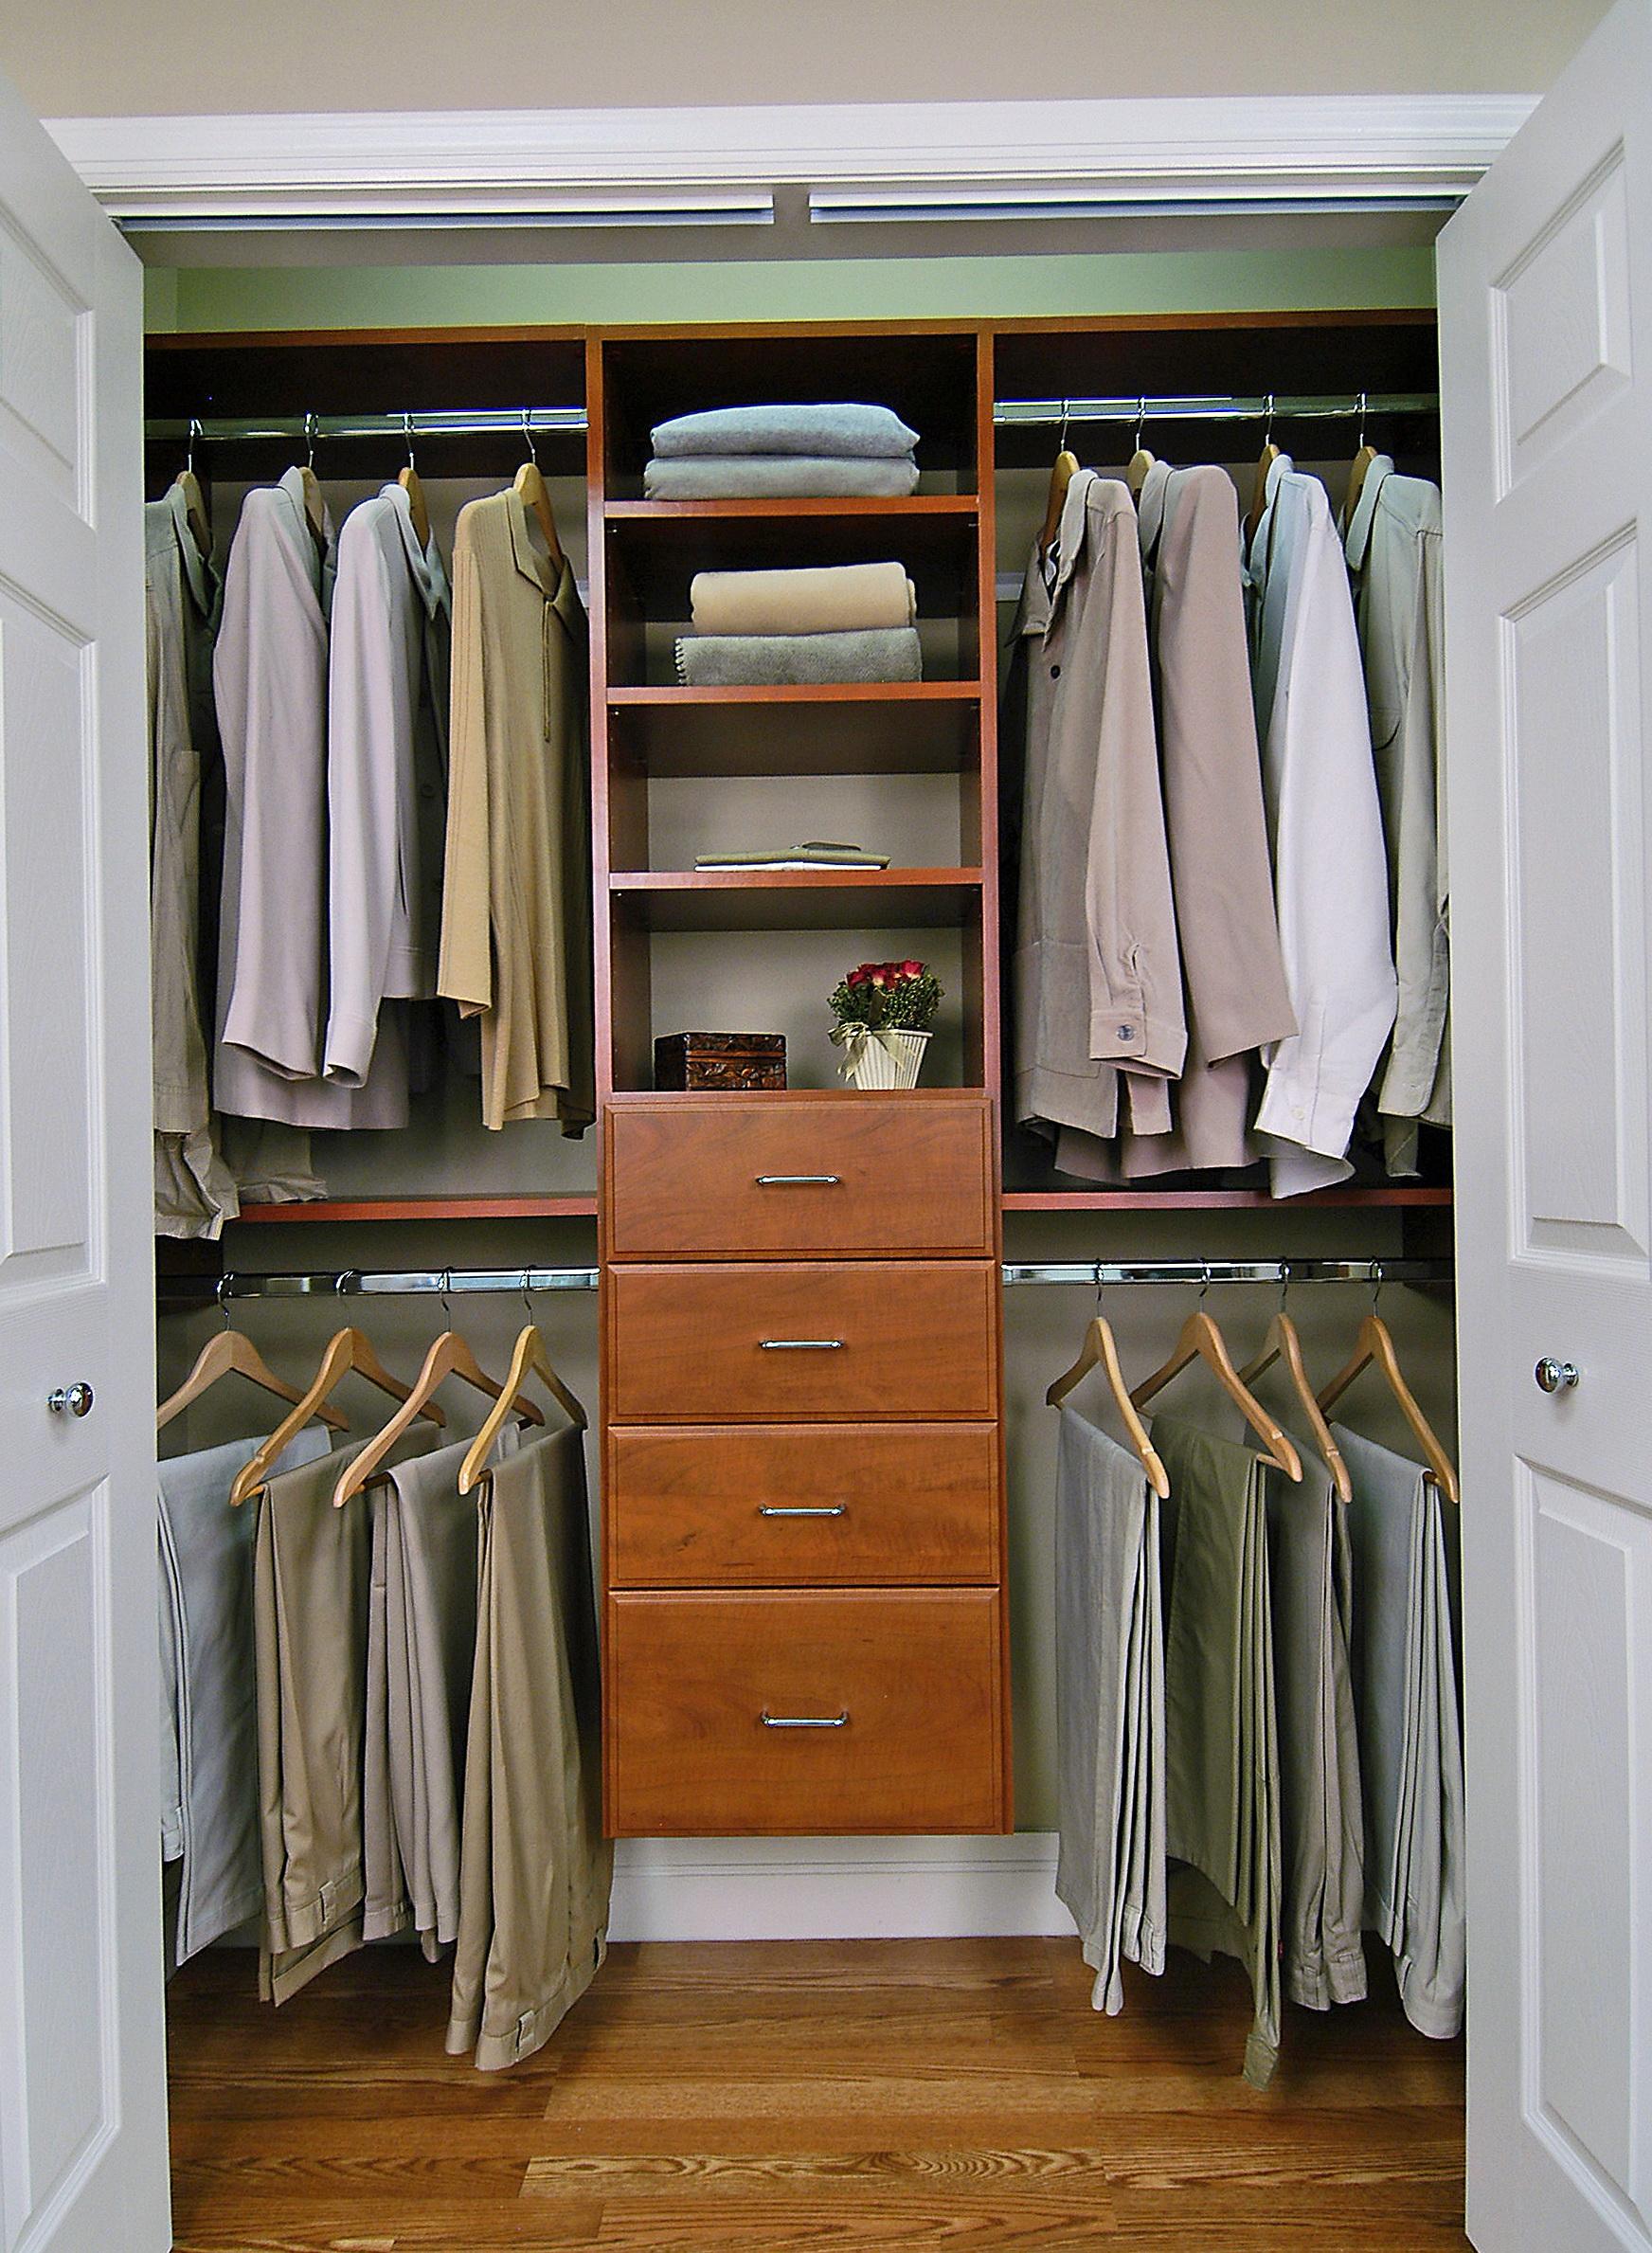 Closet Design Tool Ipad Home Design Ideas